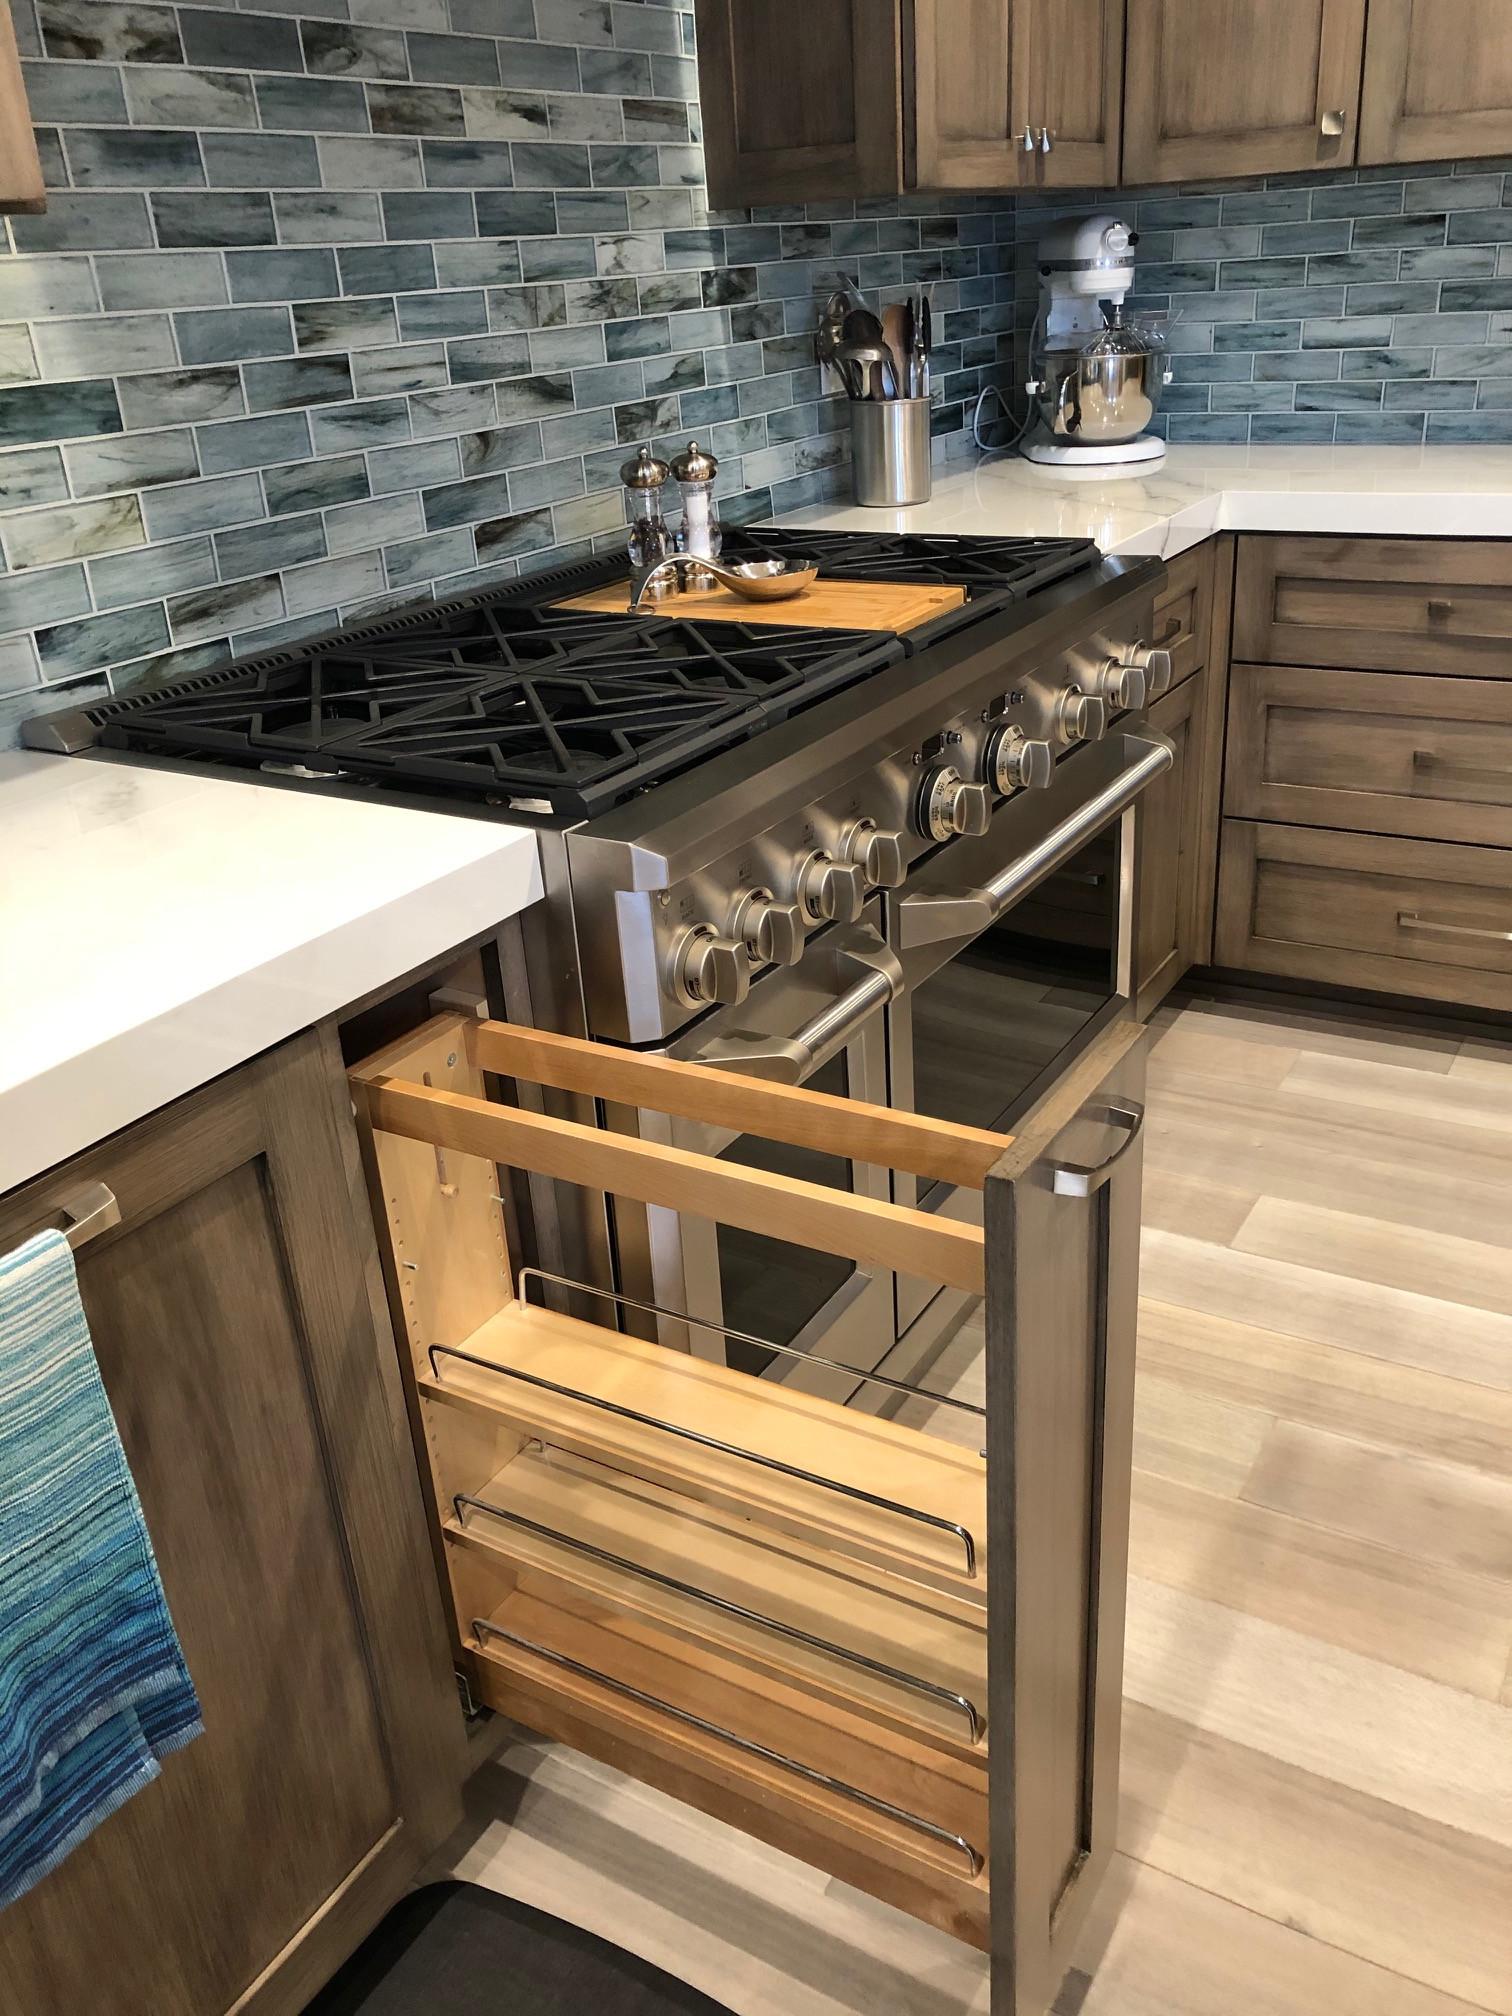 Kitchen sliding spice rack